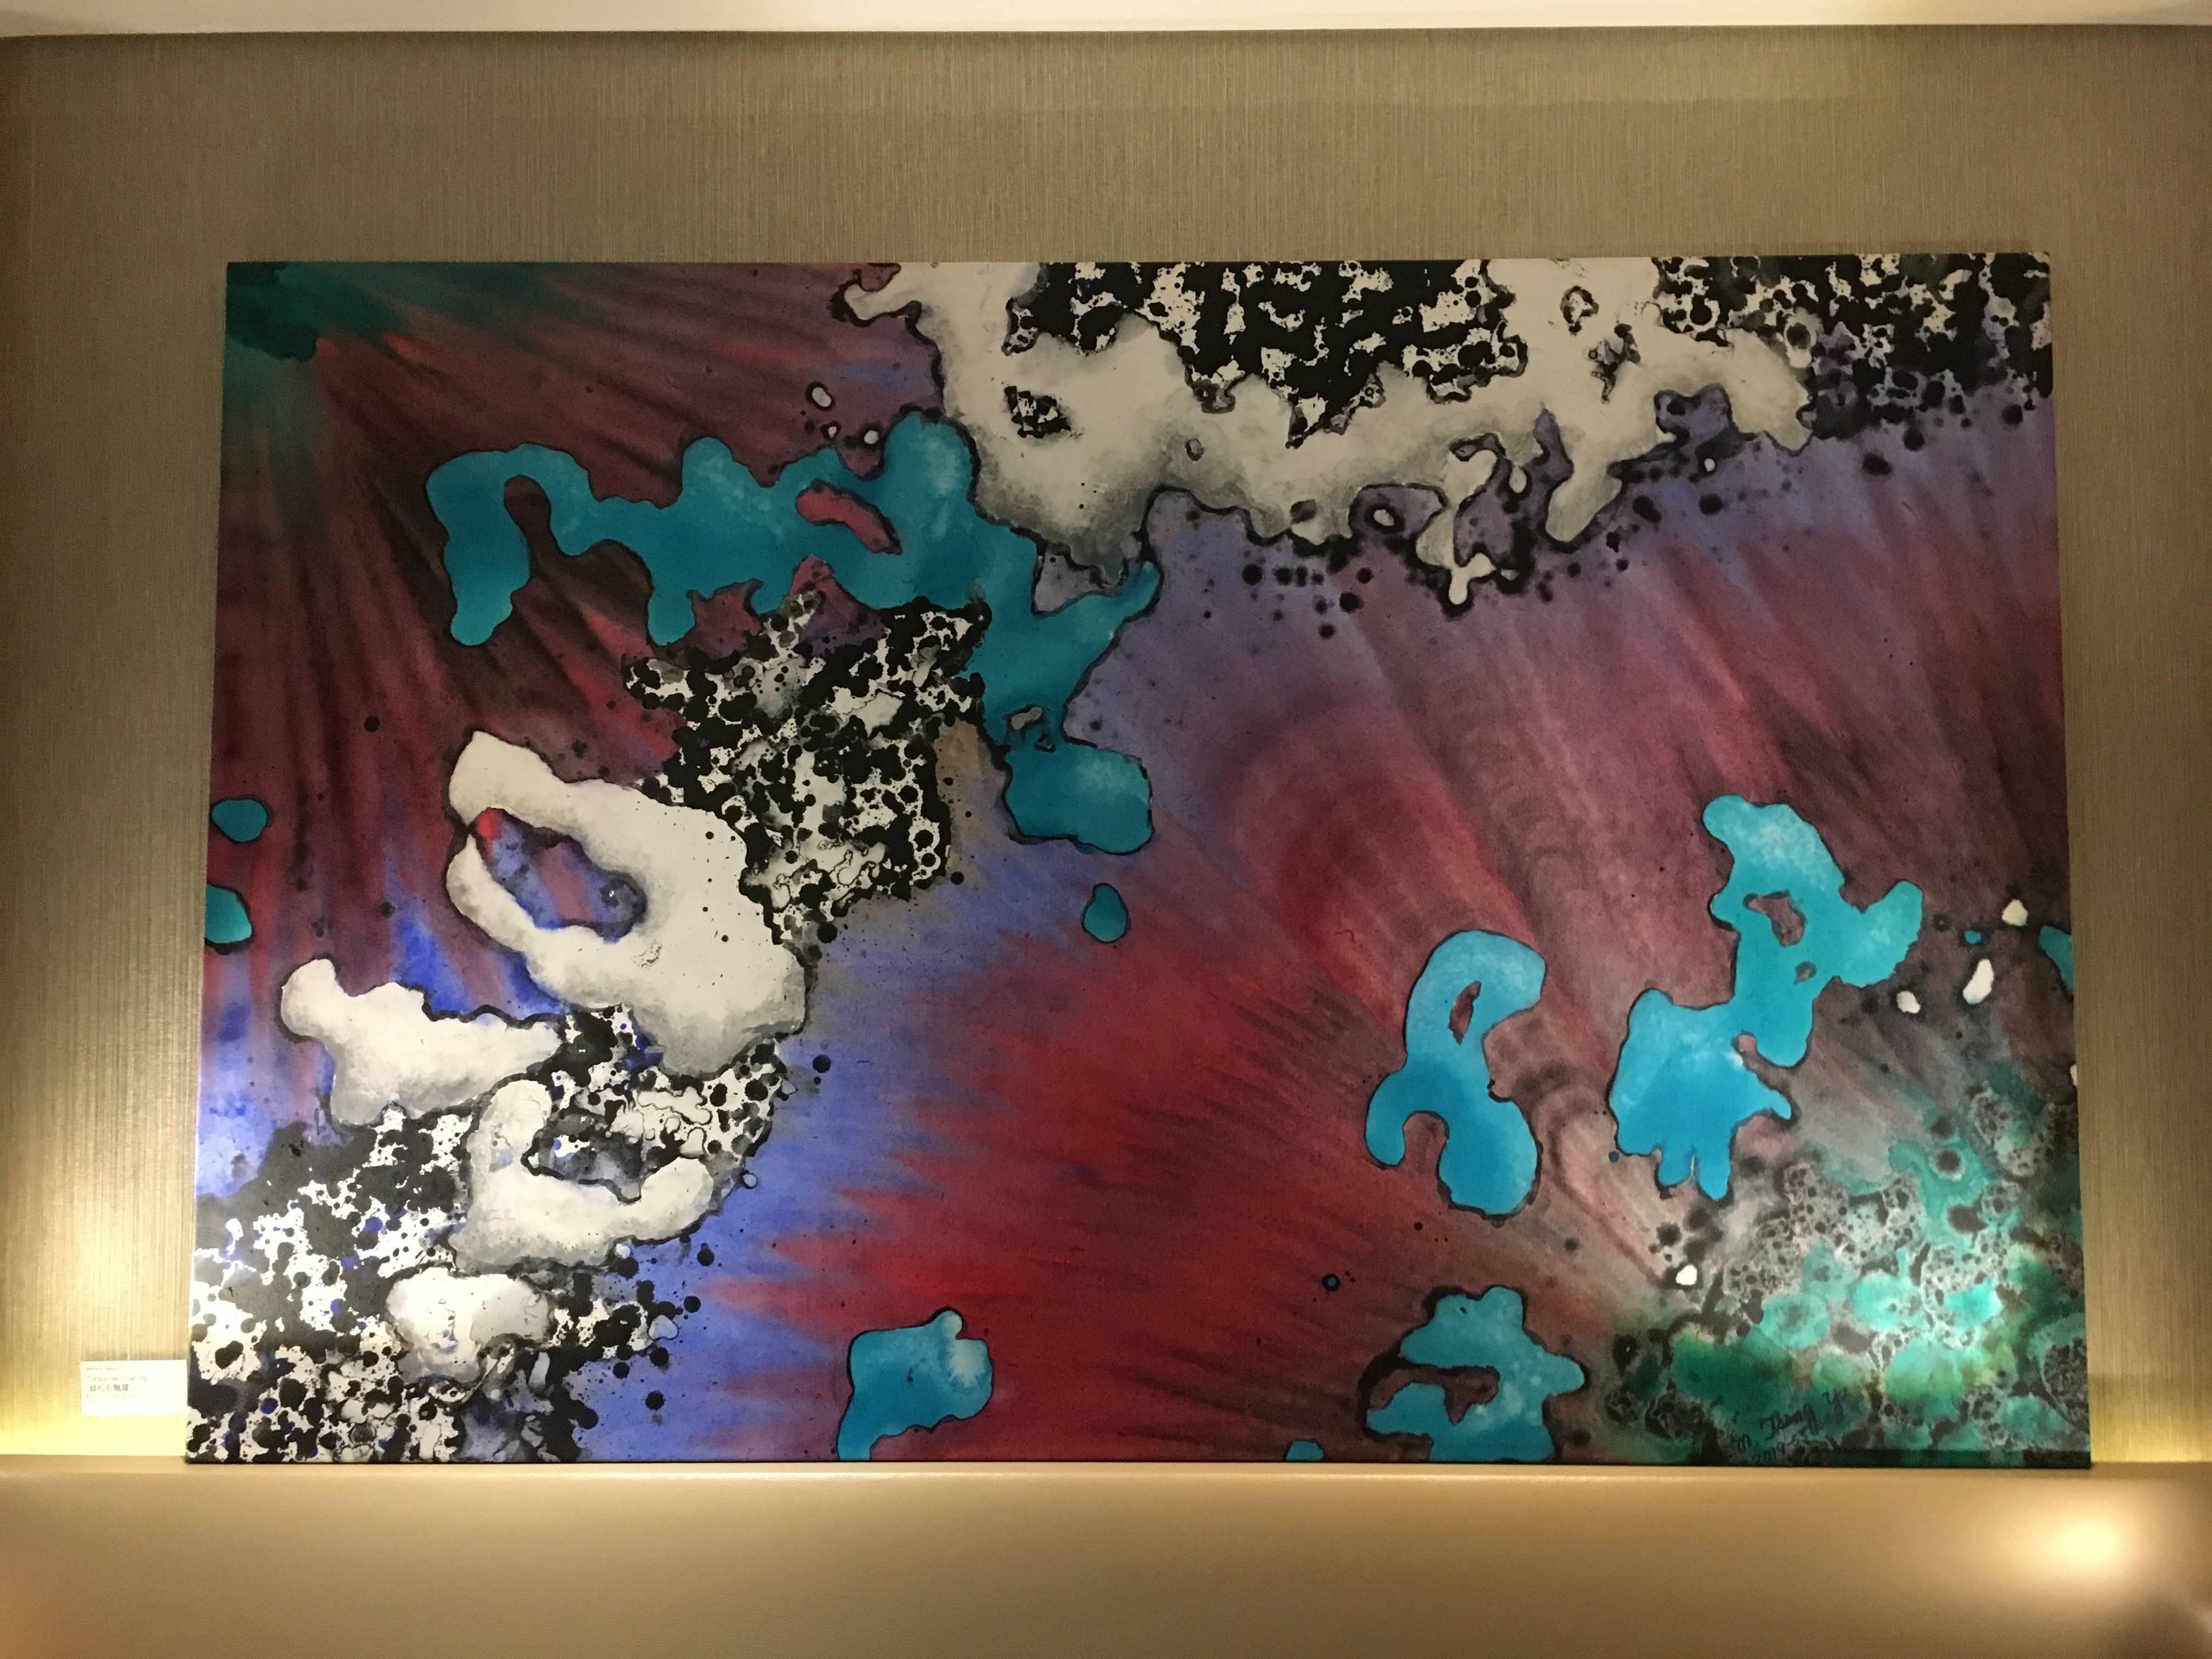 米崴藝術展出藝術家 -  Marlene Tseng Yu《Iceberg/aurora australis 冰山與北極綠光》,117 x 175 cm,Acrylics on canvas,2019。